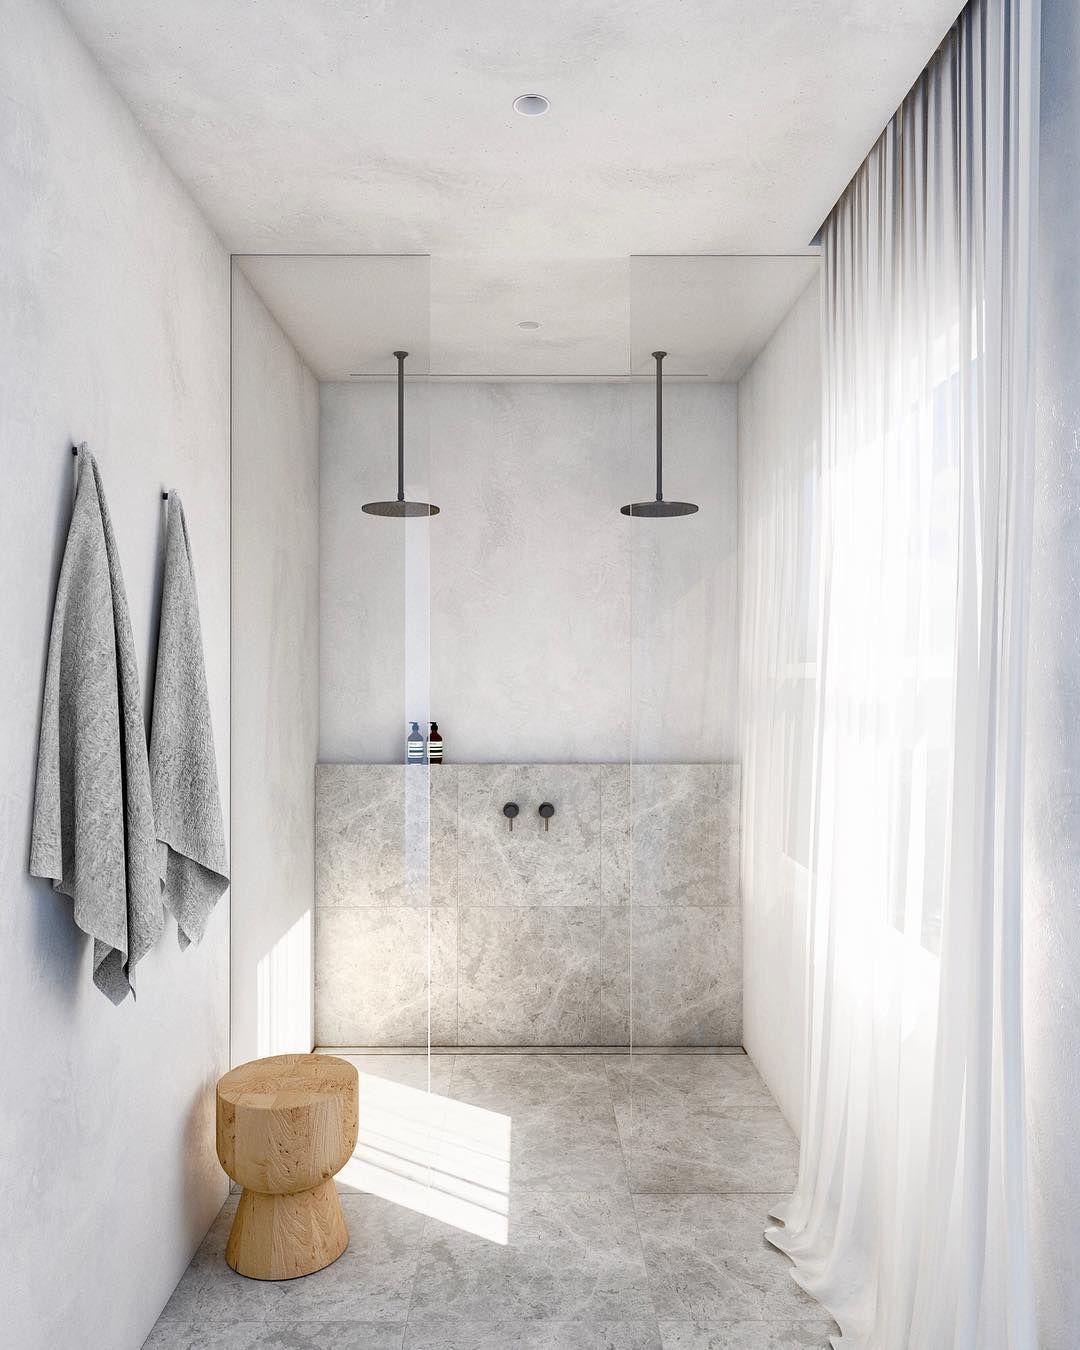 Interior Scandinavian Design On Instagram Now That S A